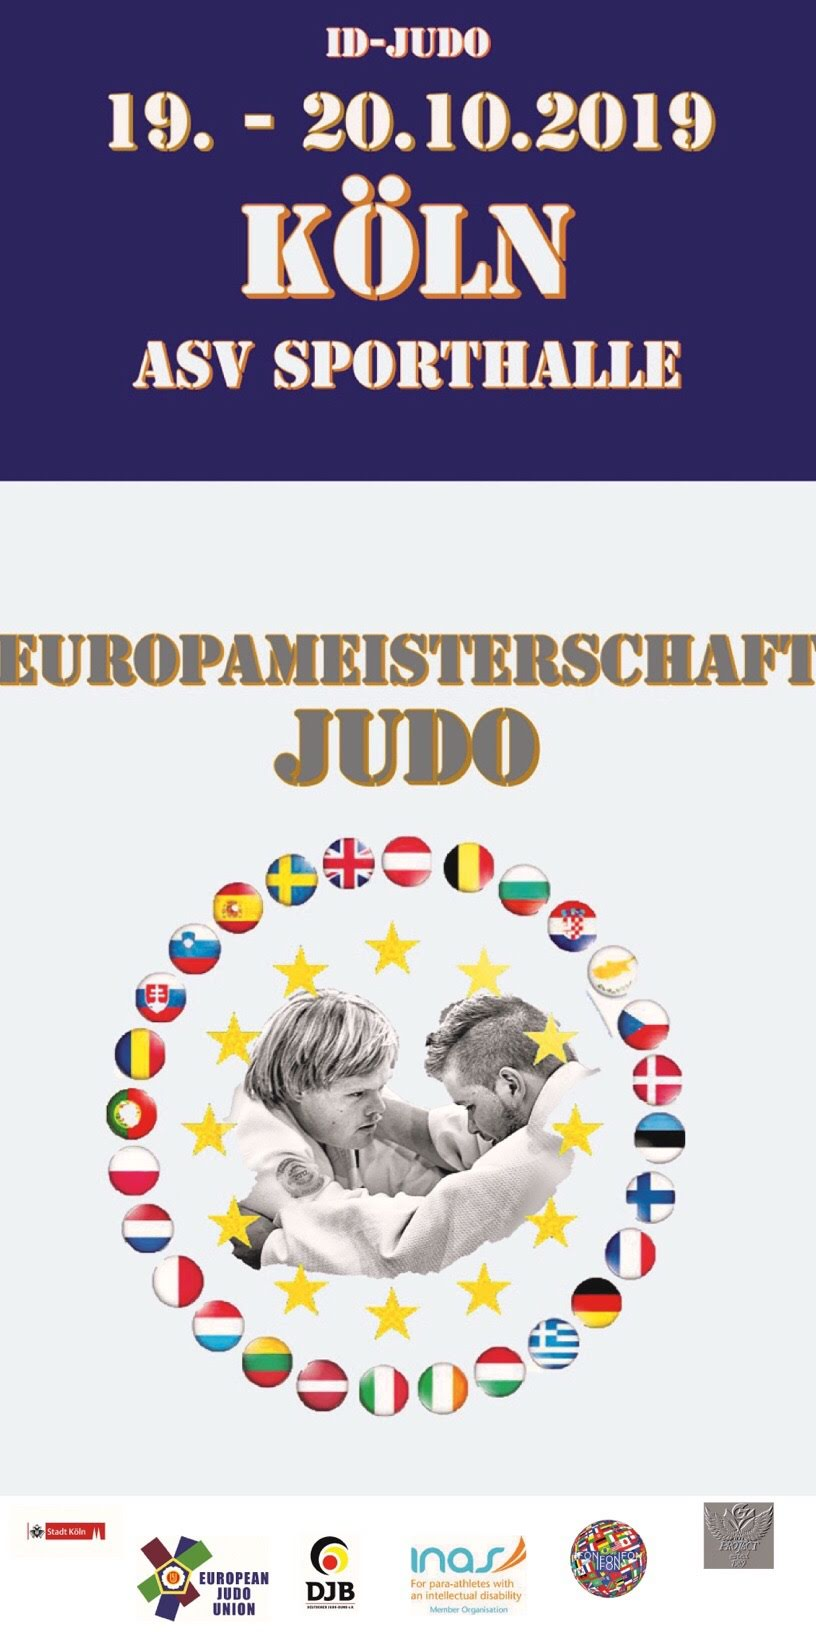 2019 – Judo Europameisterschaft   ID-Judo in Köln